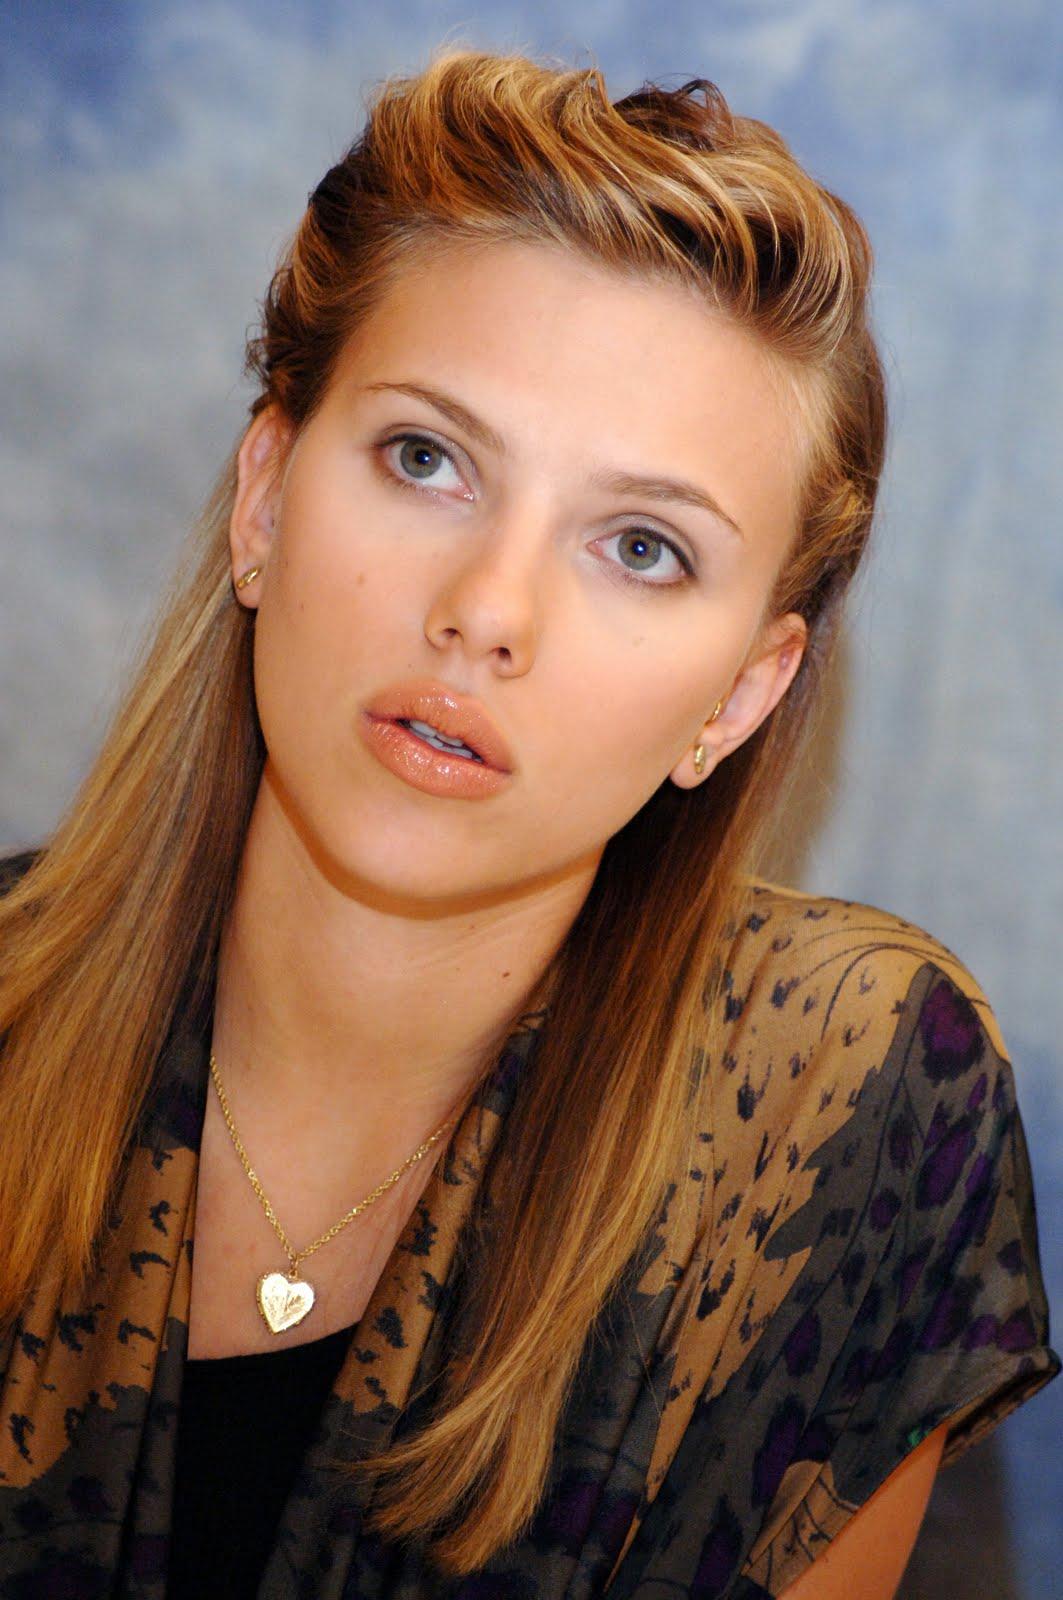 Scarlett Anderson Net Worth